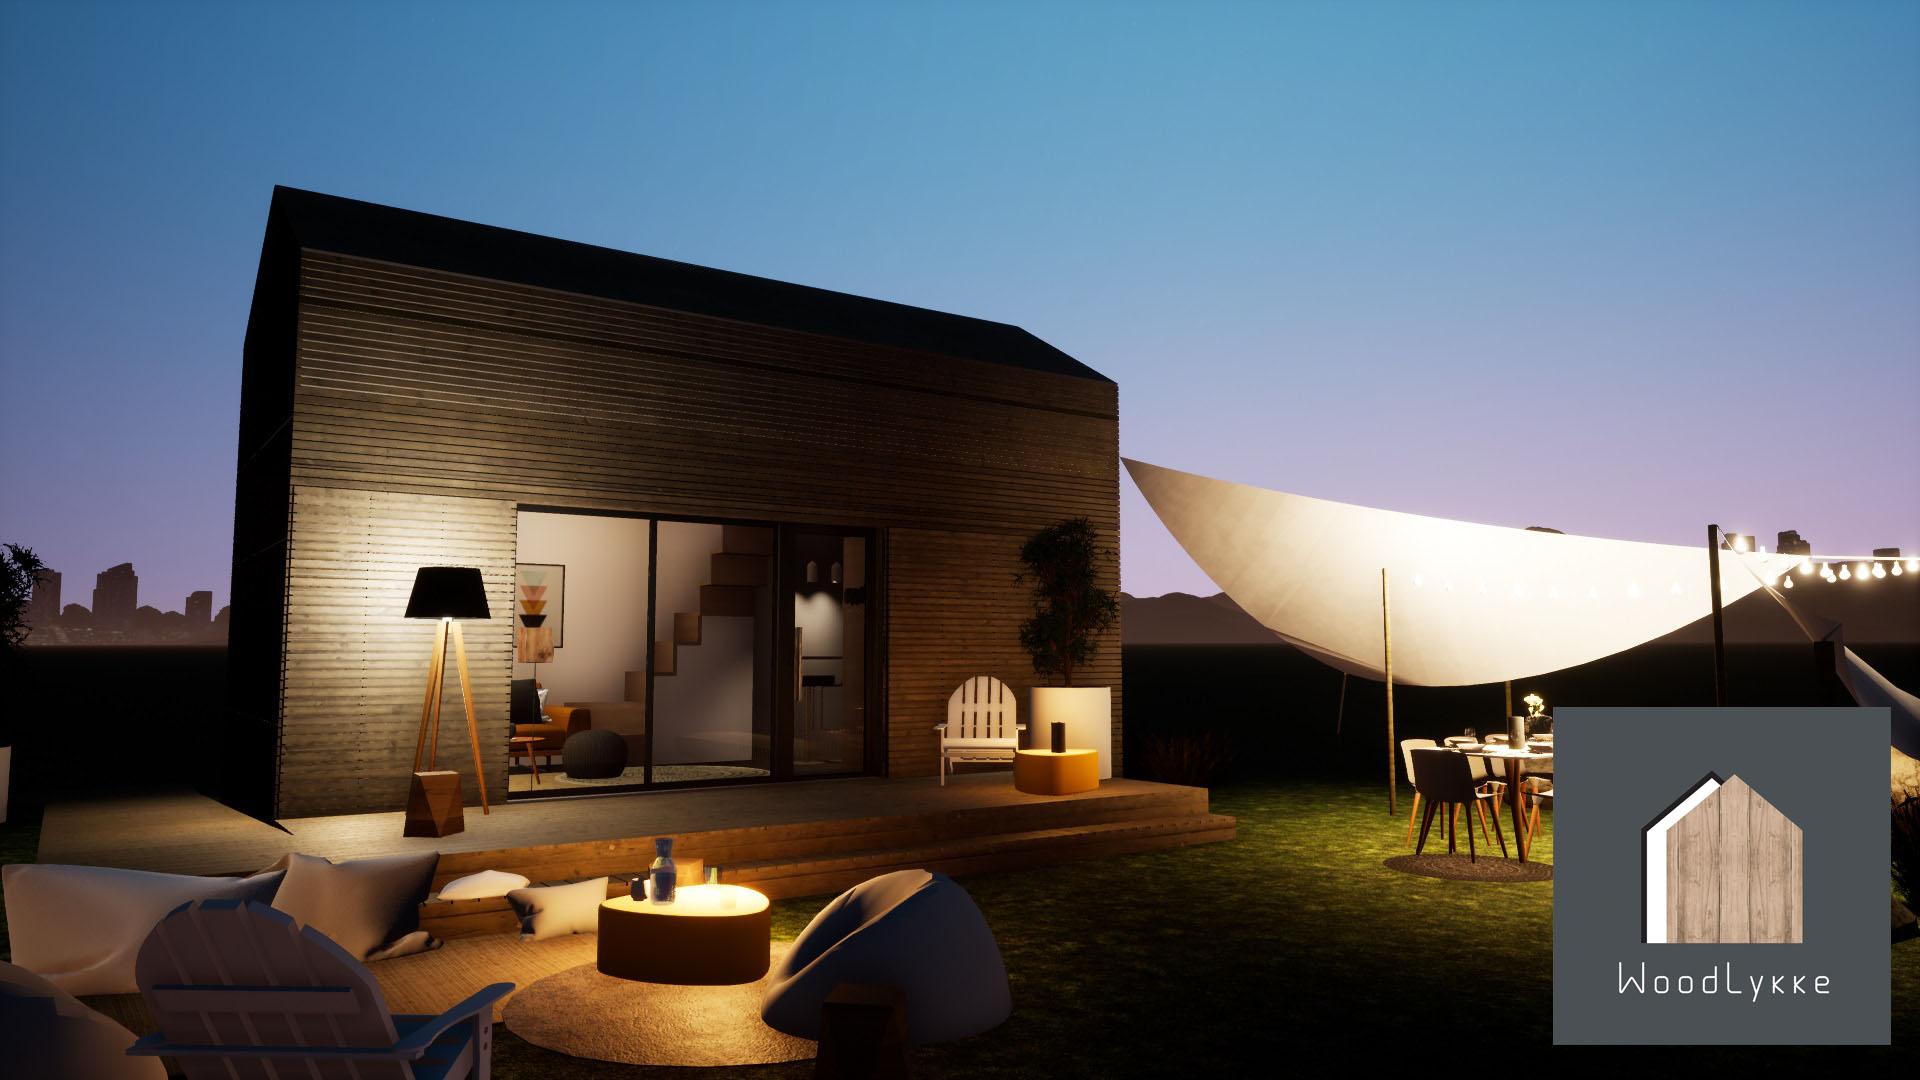 Woodlykke des mini maisons fonctionnelles et modernes for Salon made in france